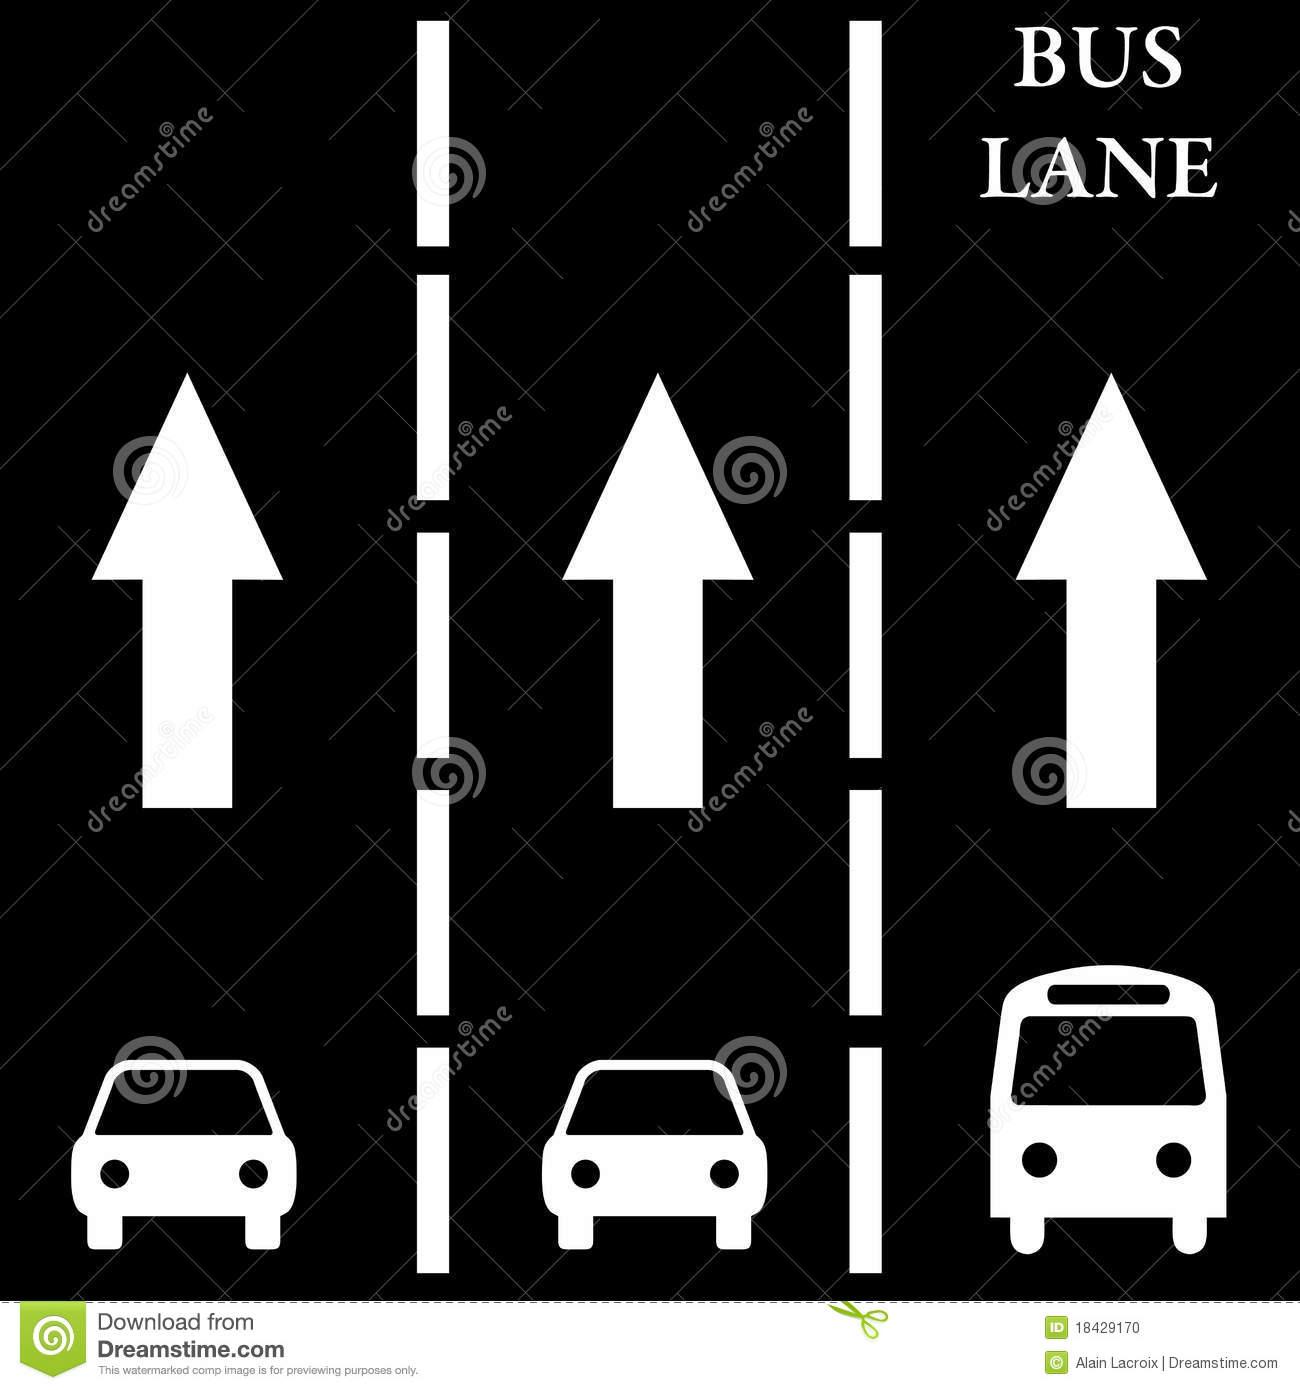 Bus Lane Stock Photo.